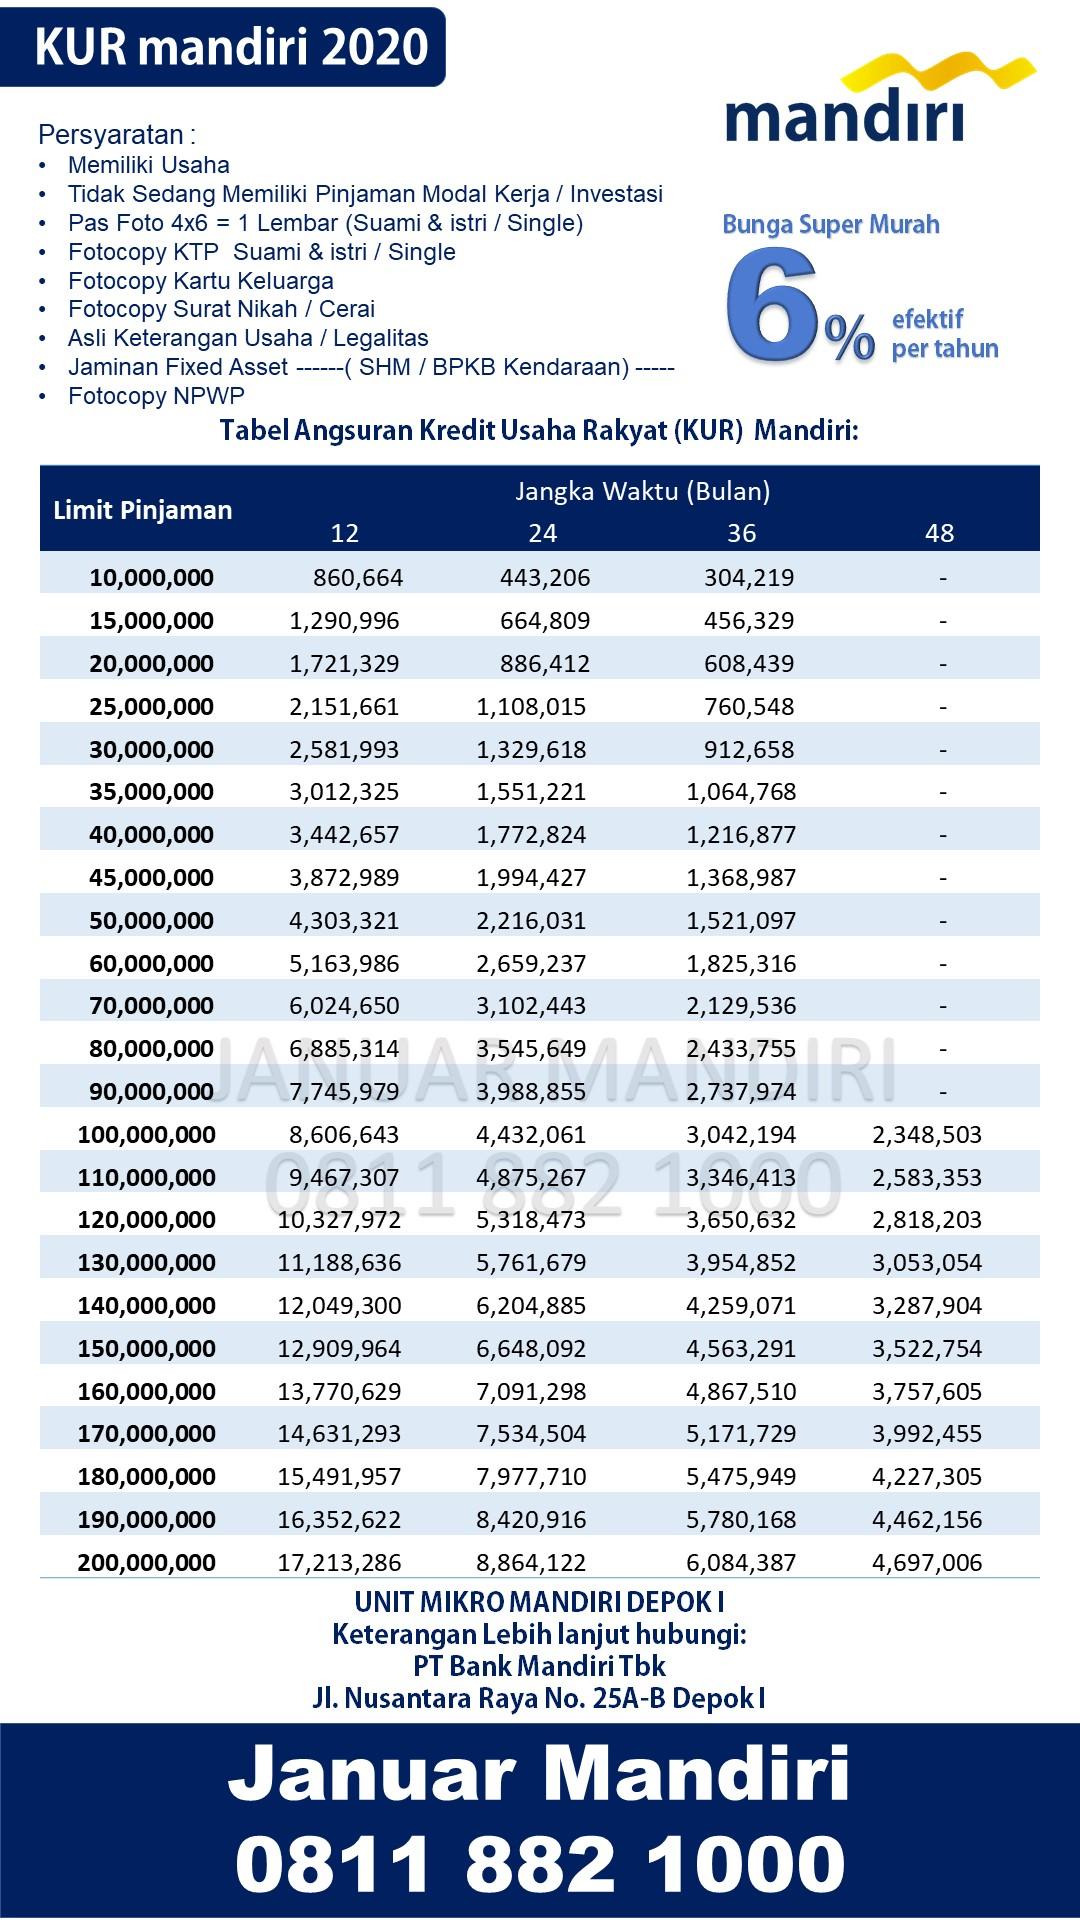 Tabel Angsuran Kur Mandiri : tabel, angsuran, mandiri, Kredit, Usaha, Rakyat, (KUR), Mandiri, Pinjaman, Depok